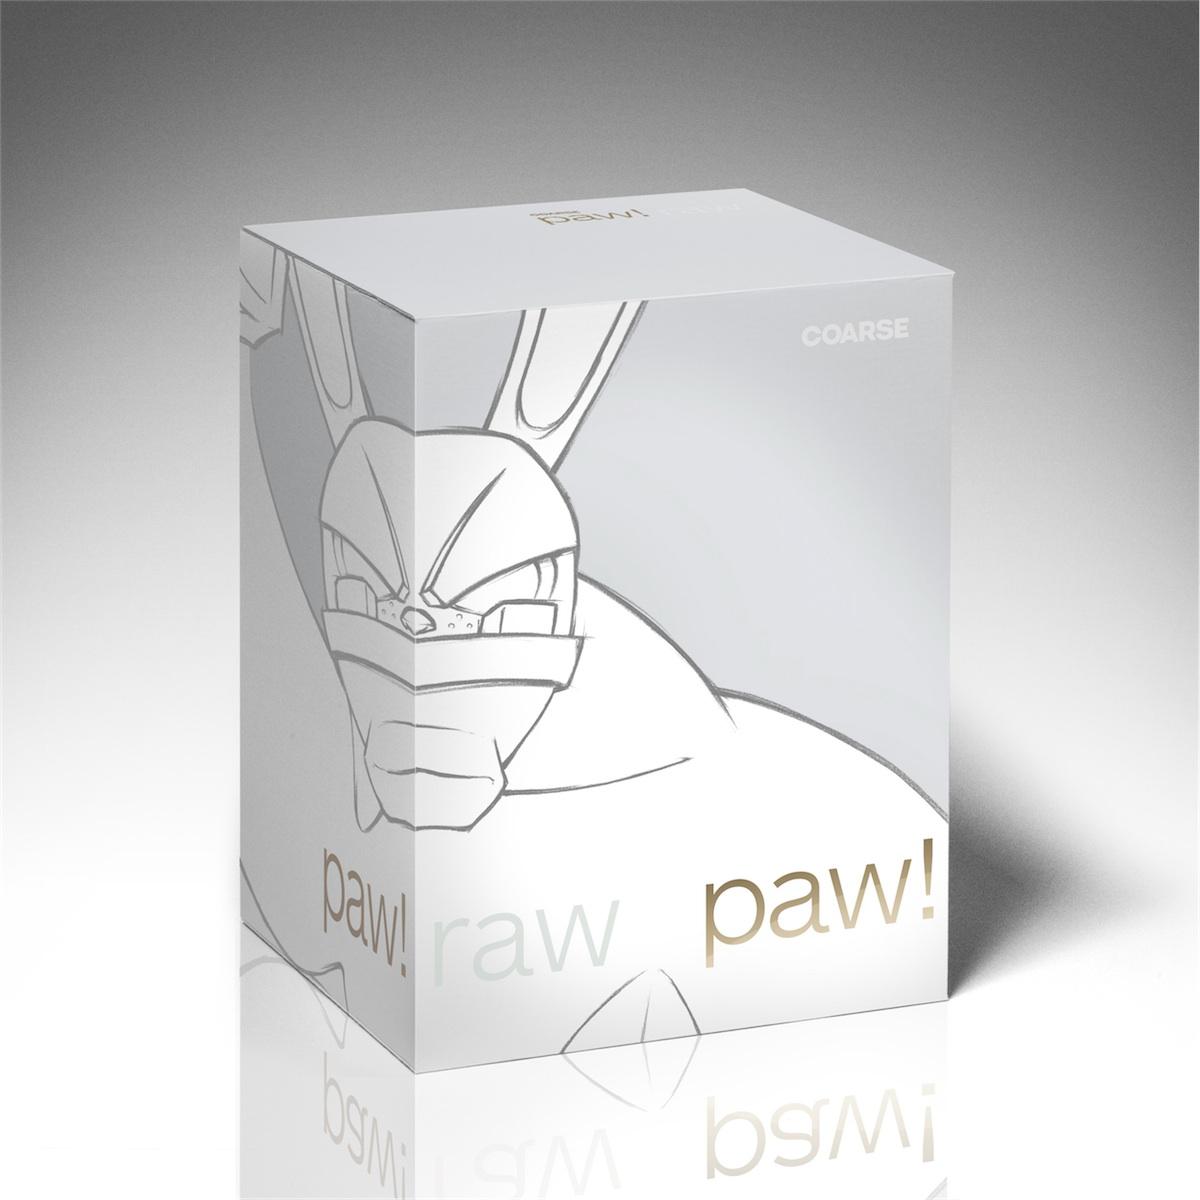 paw_raw_packaging_web.jpg